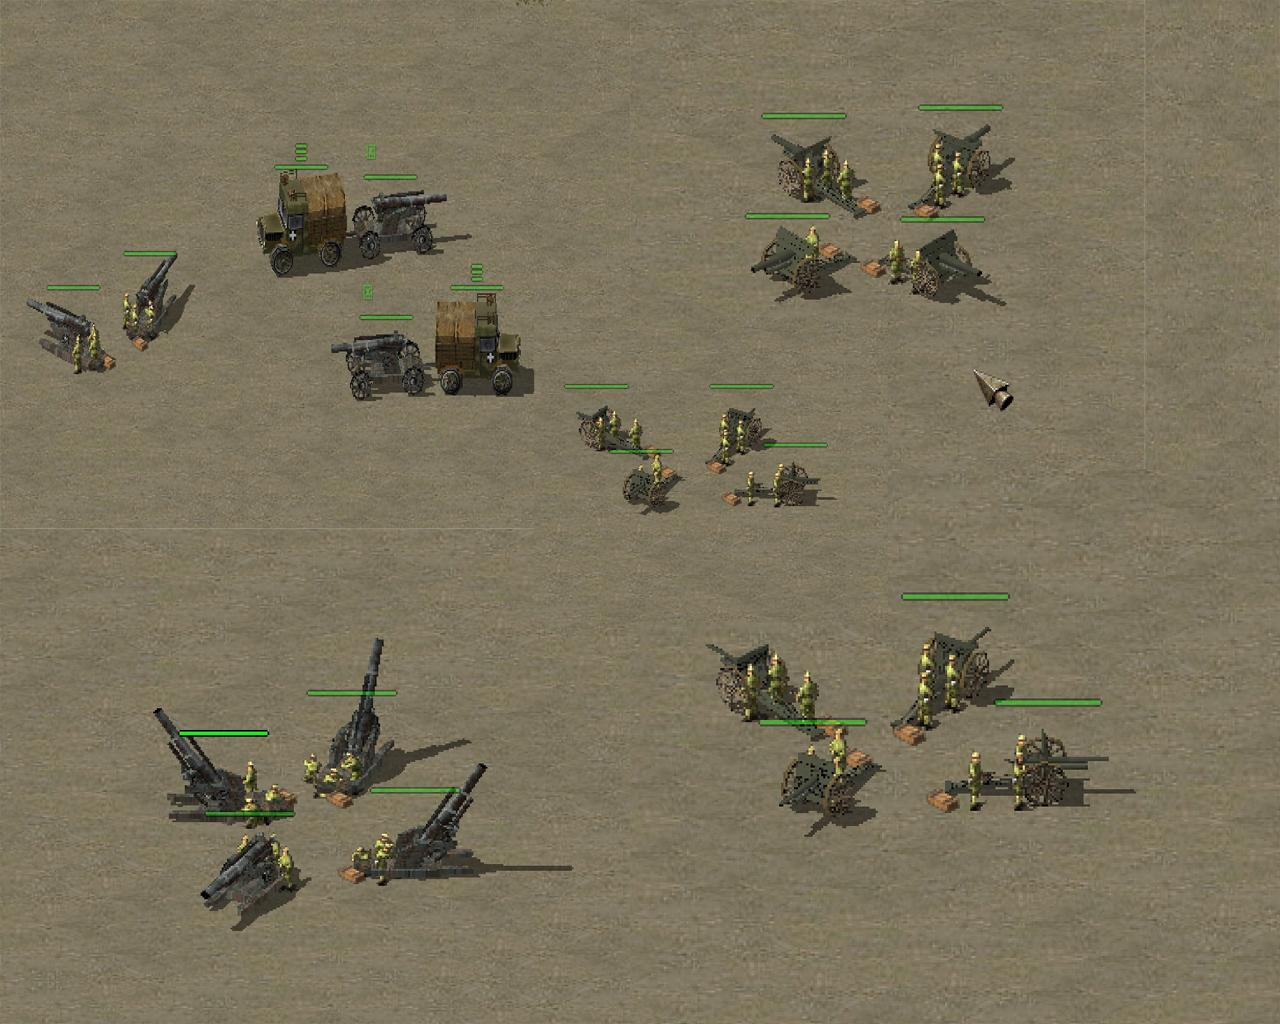 http://gabgames.ucoz.hu/PICTURES/arti1.jpg